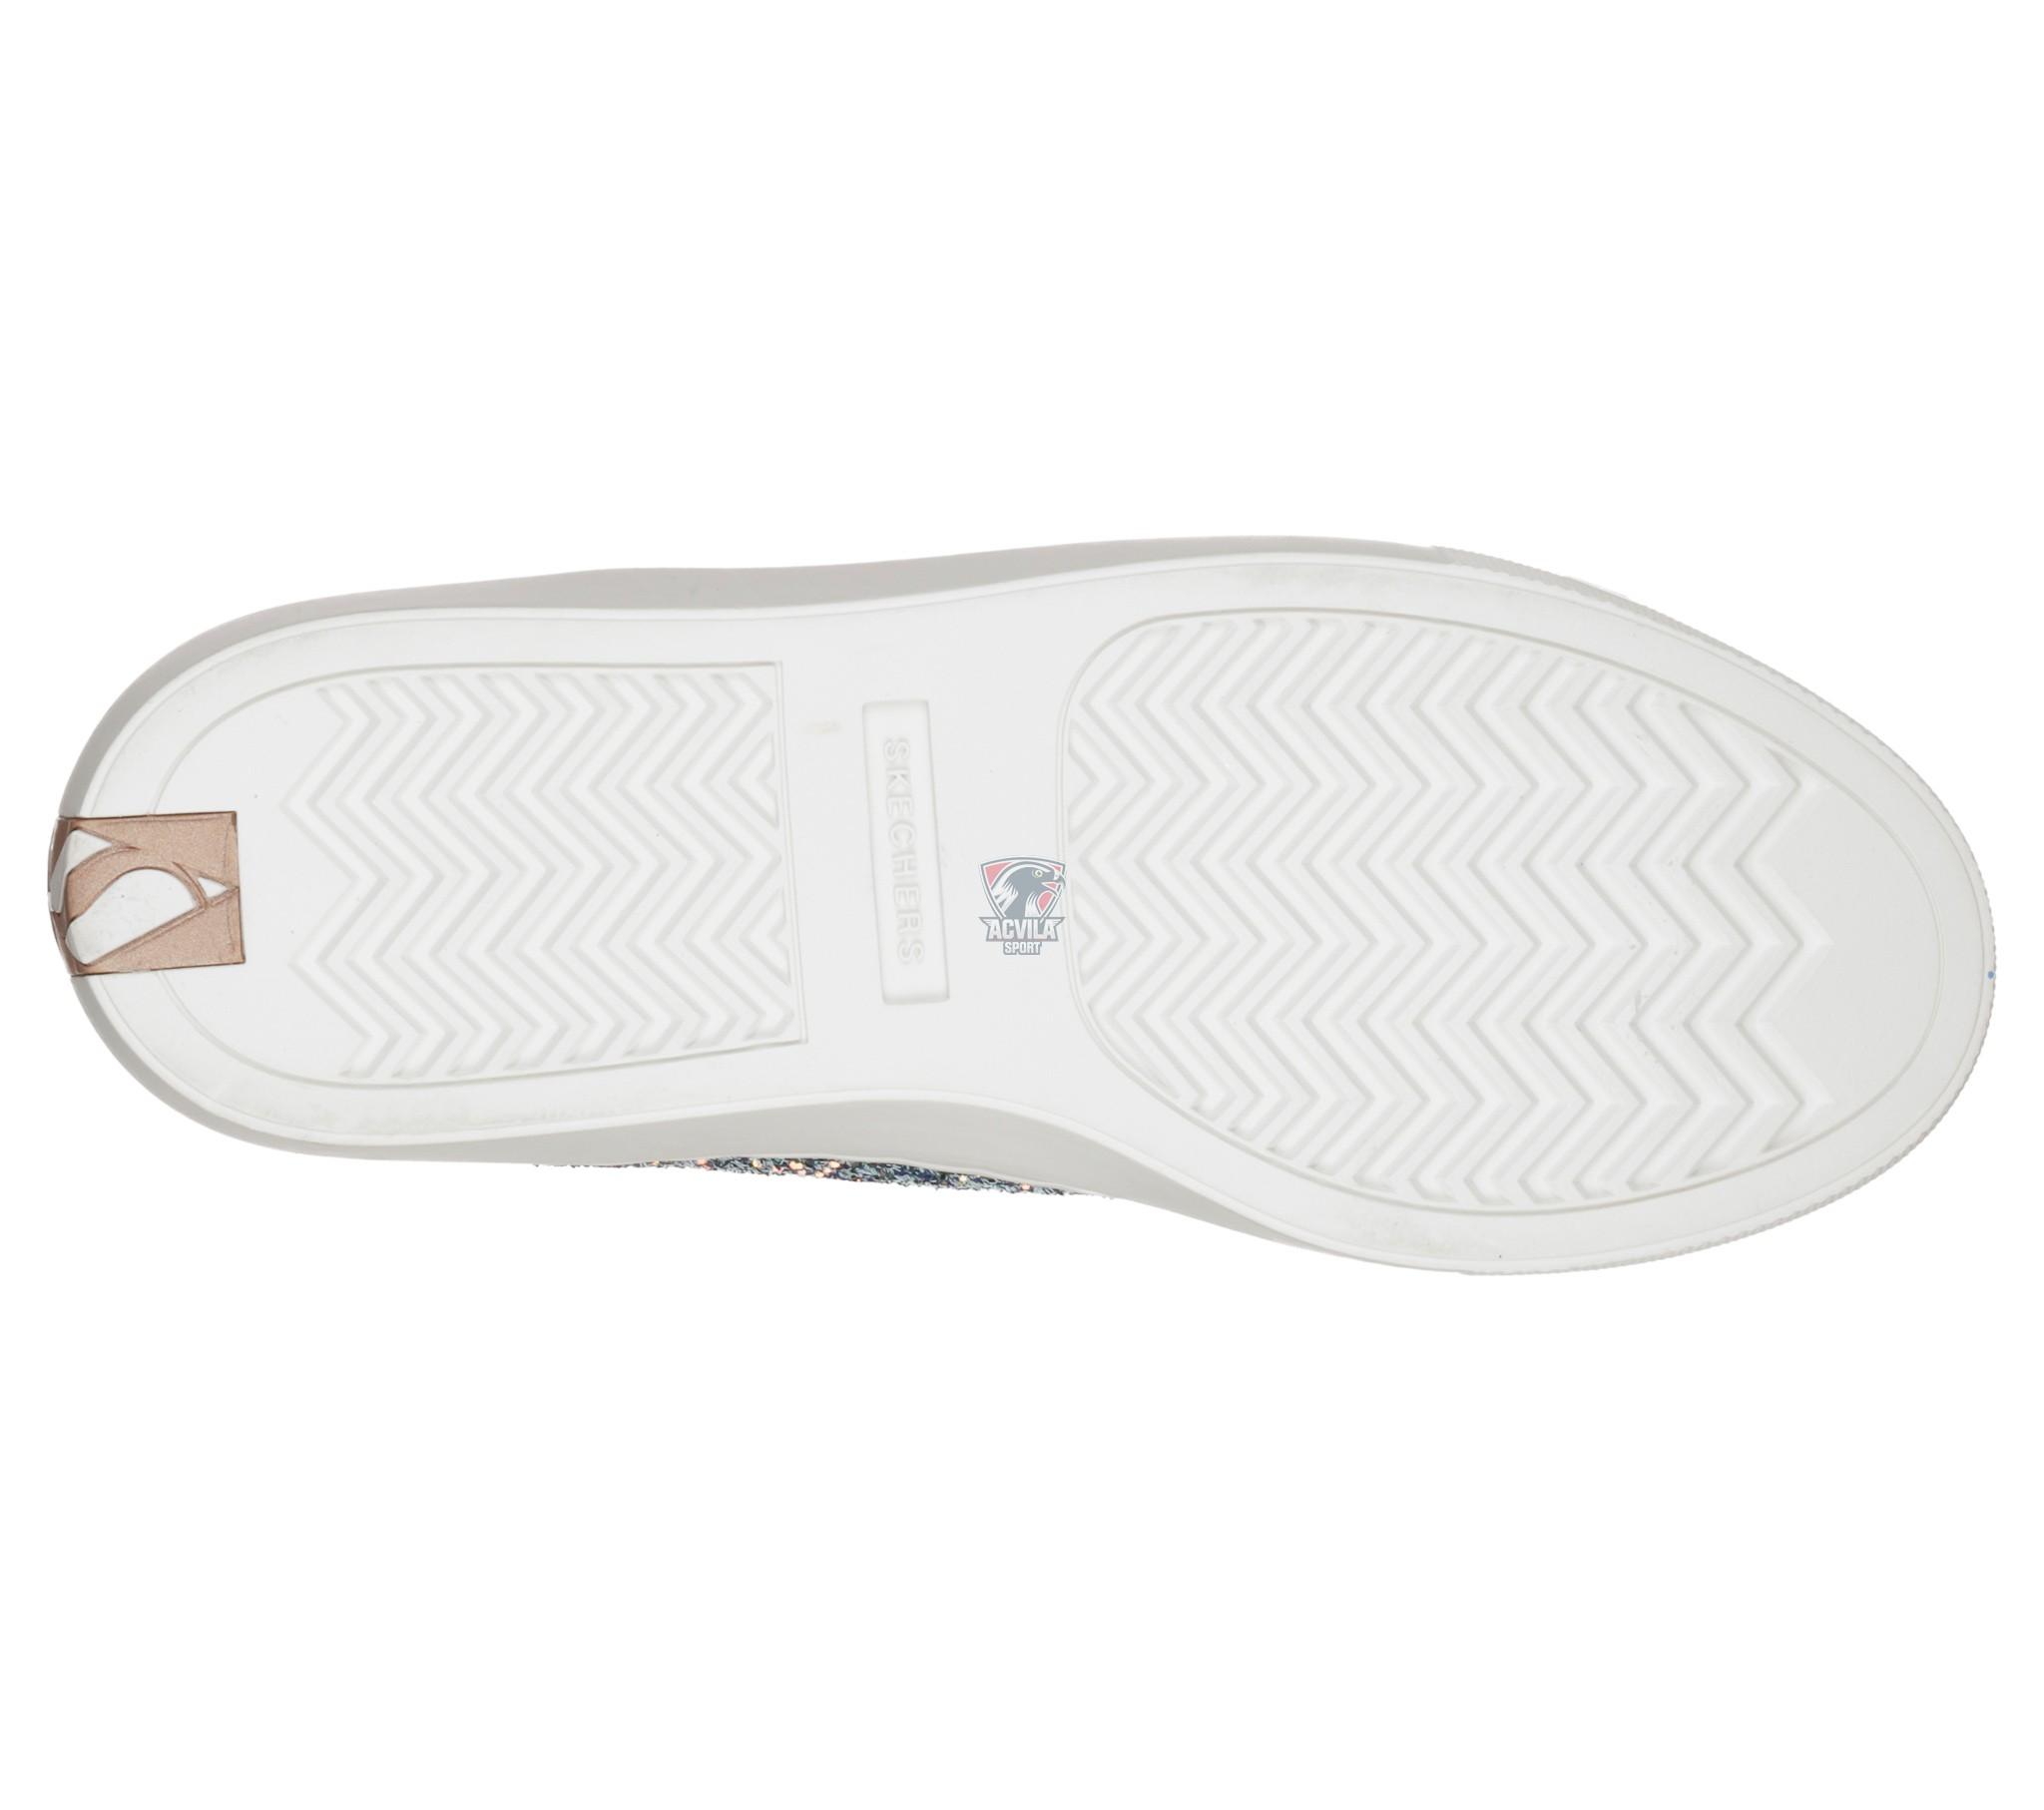 photo 4 Женская обувь SKECHERS SIDE STREET- NIGHT LIFE